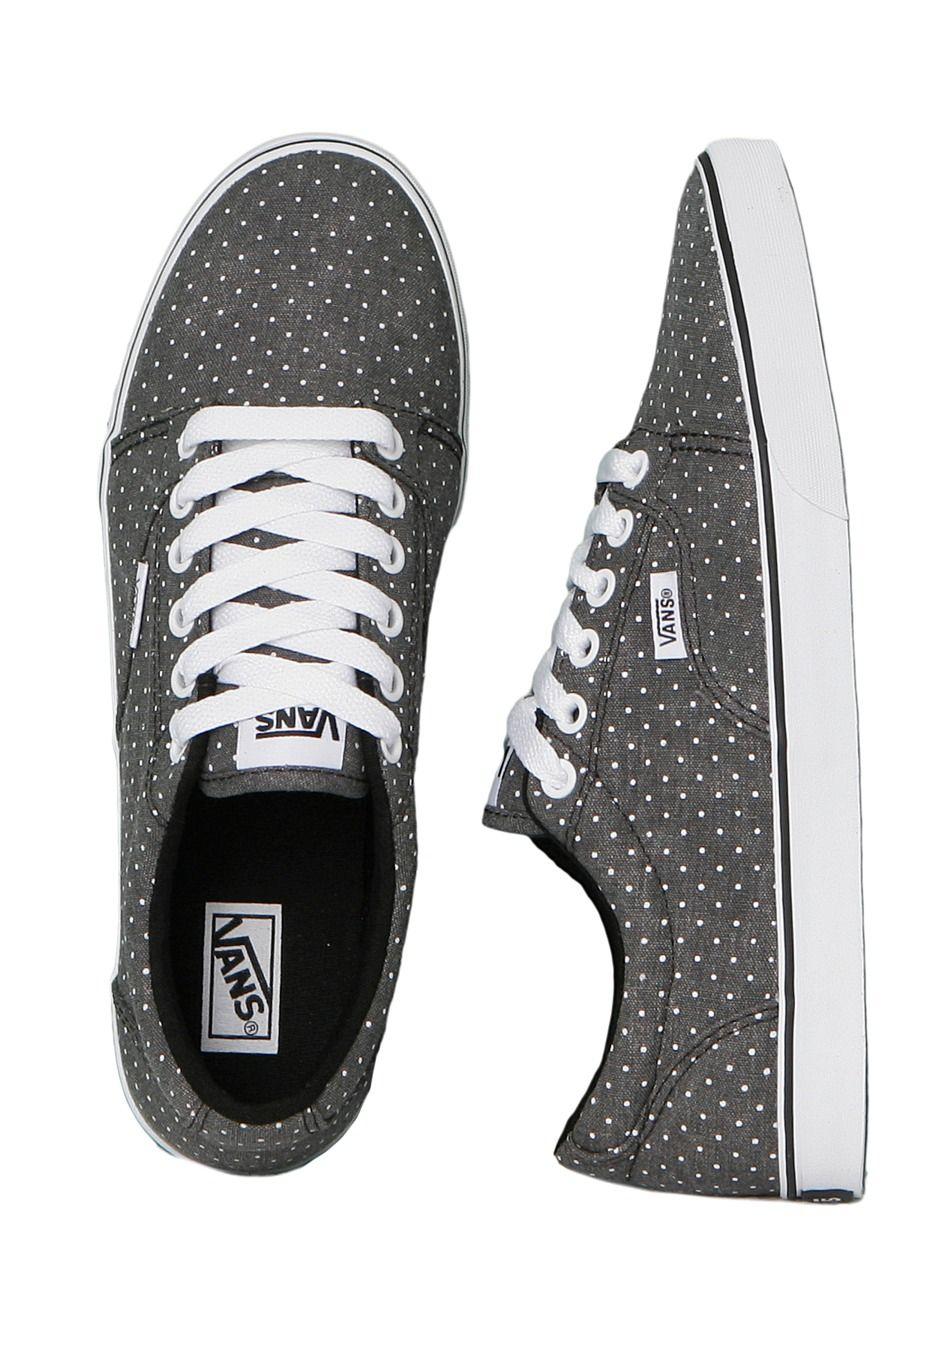 Vans - Kress Washed Dots Black/White